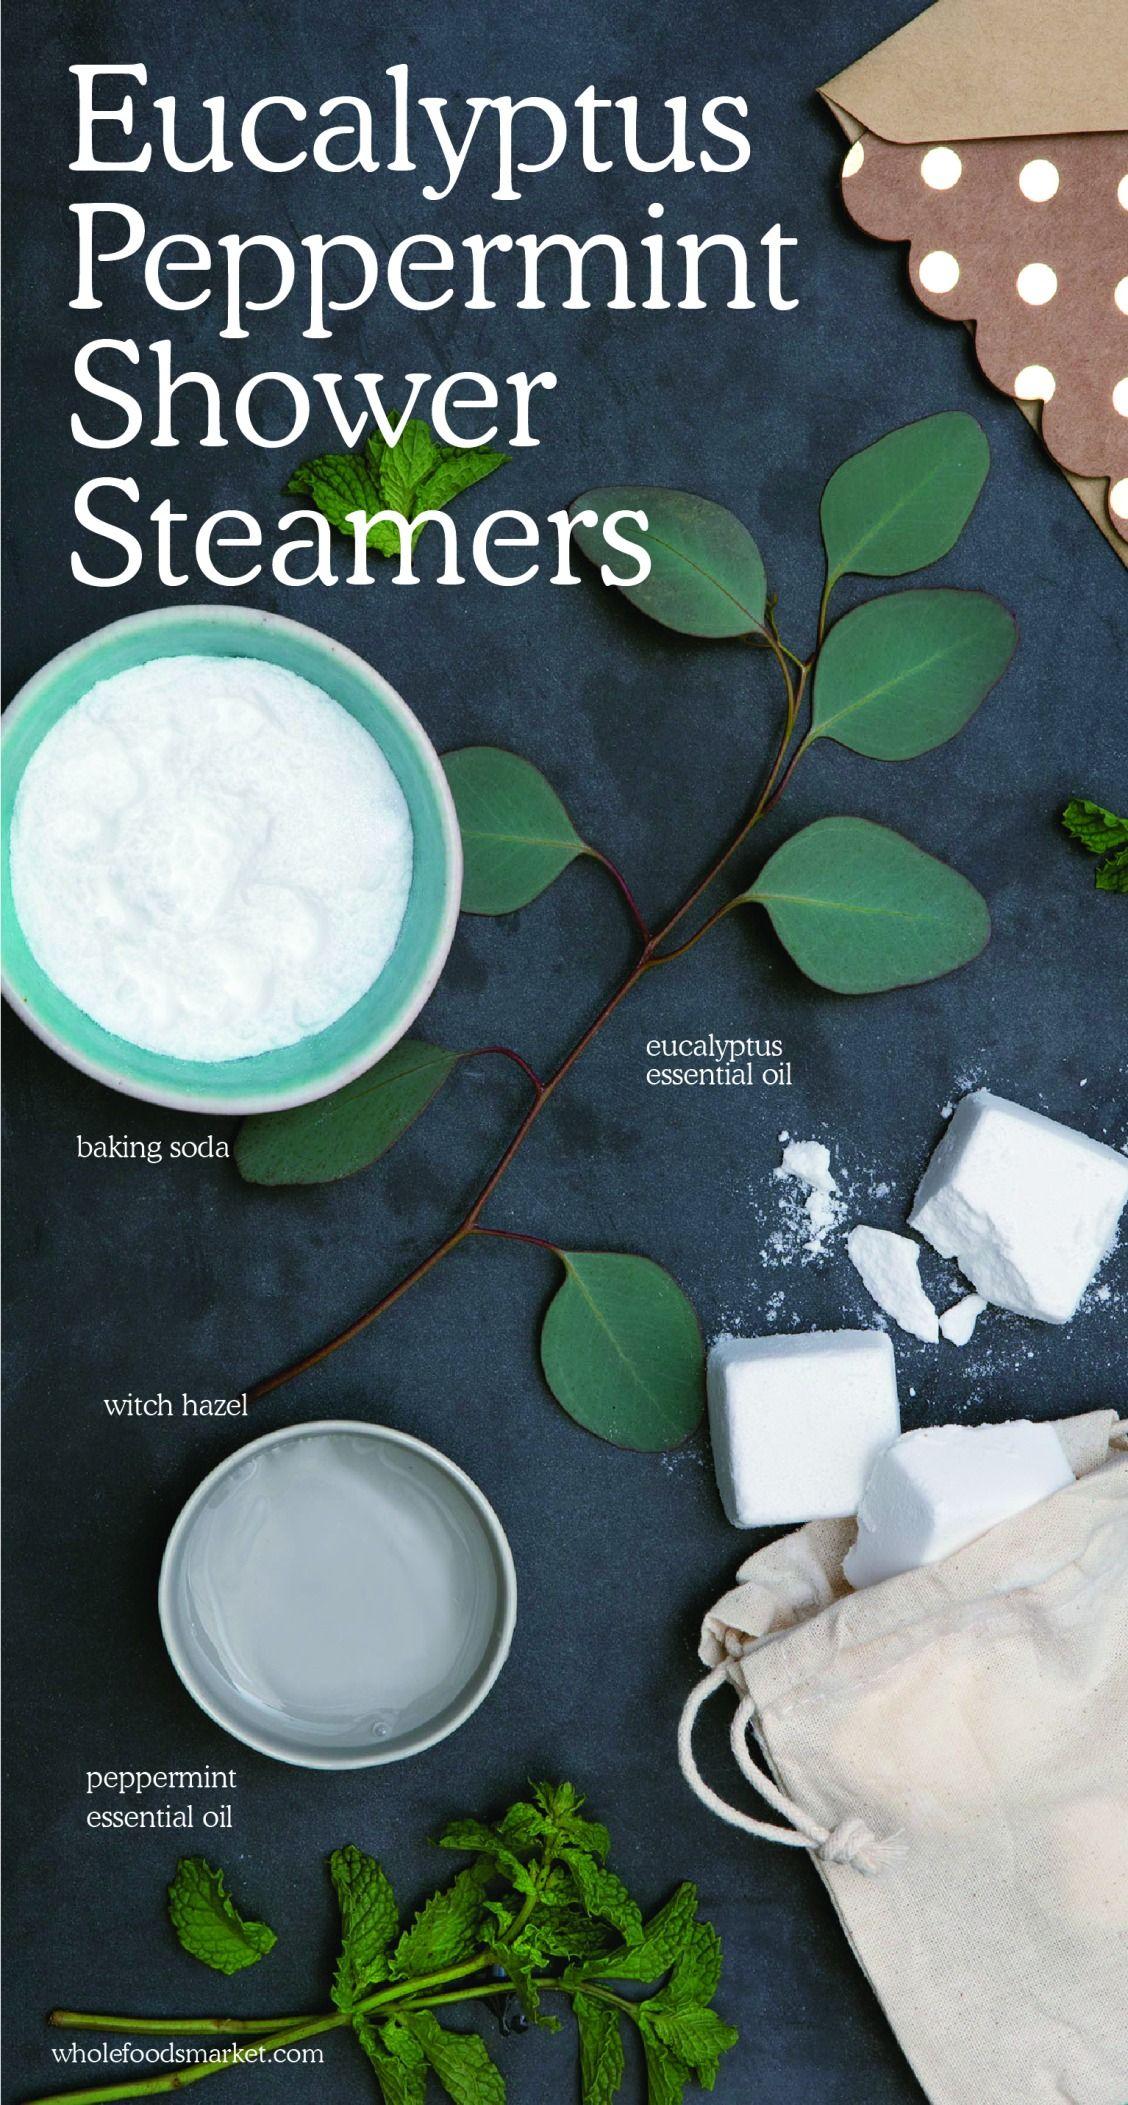 Eucalyptus Peppermint Shower Steamers | Natural Beauty DIY | Holistic Cosmetics | Eucalyptus Essential Oil, Baking Soda, Witch Hazel, Peppermint Essential Oil - Luxury Beauty - http://amzn.to/2hZFa13